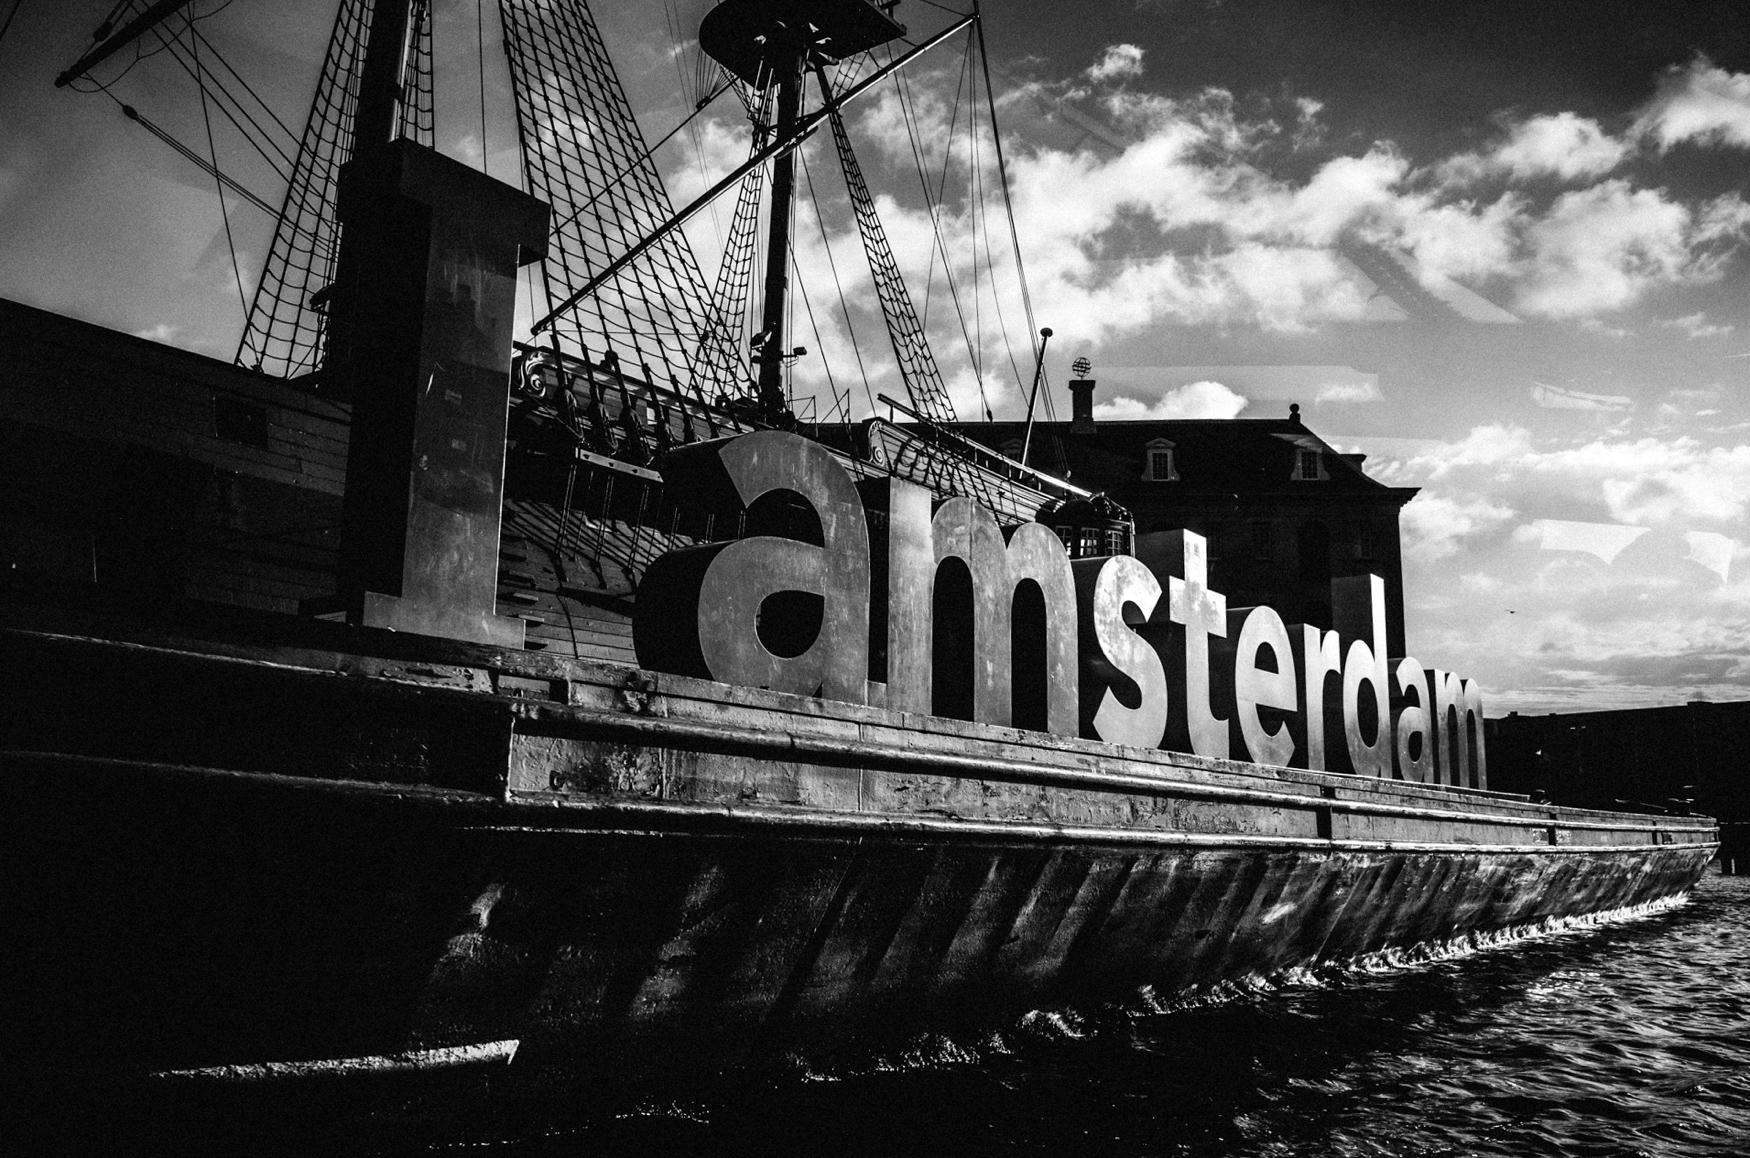 A&M amsterdam engagement & wedding photographer - session 004.jpg